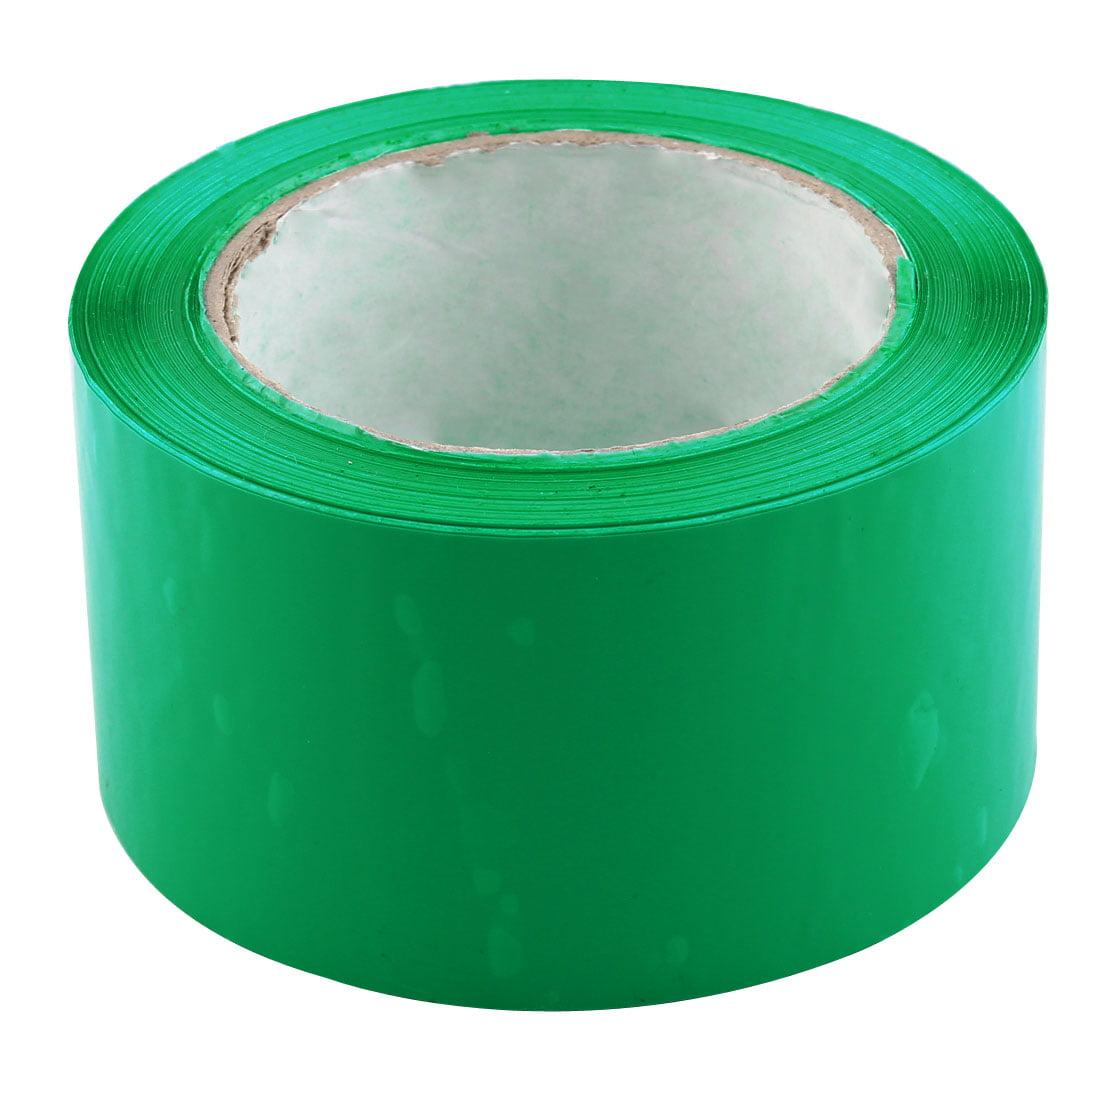 Shipping PVC Box Sealing Adhesive Tape Green 2.4'' x 98.4 Yards(295.3 Ft)